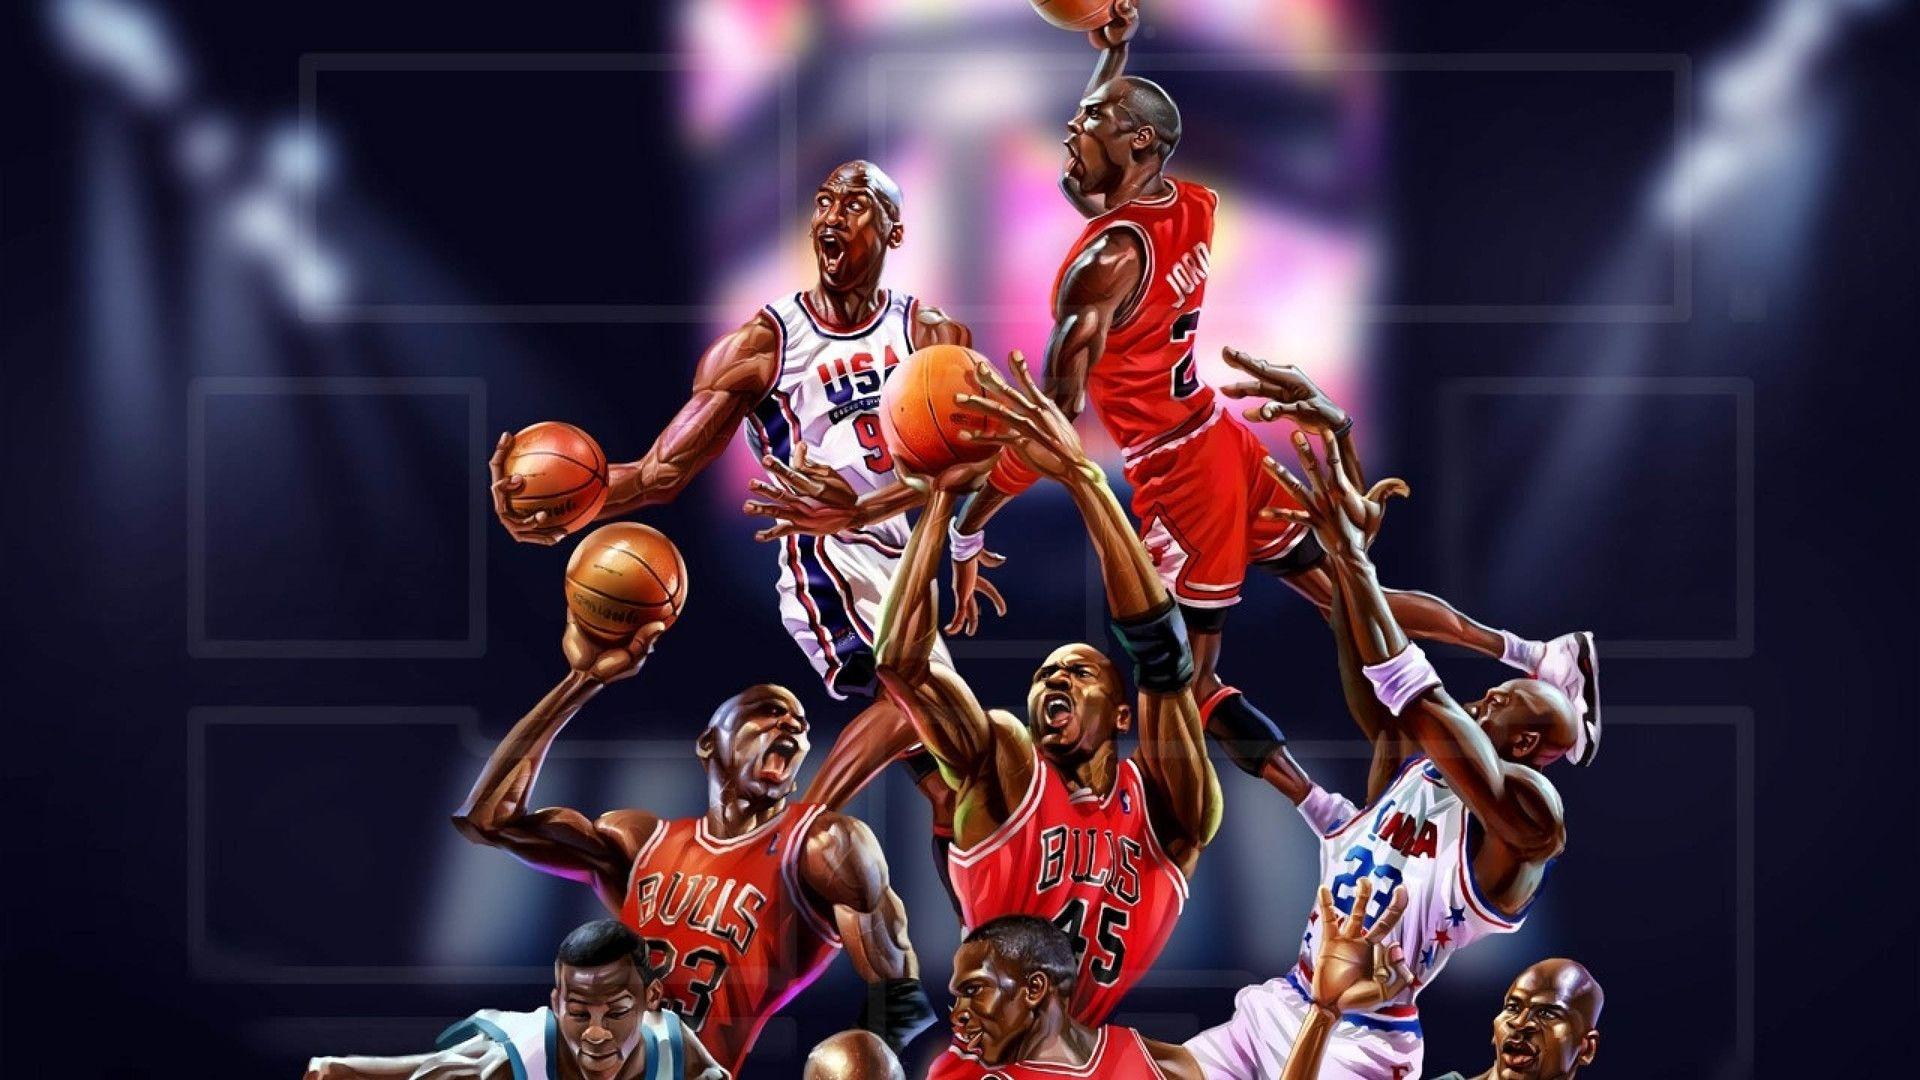 Michael Jordan computer background